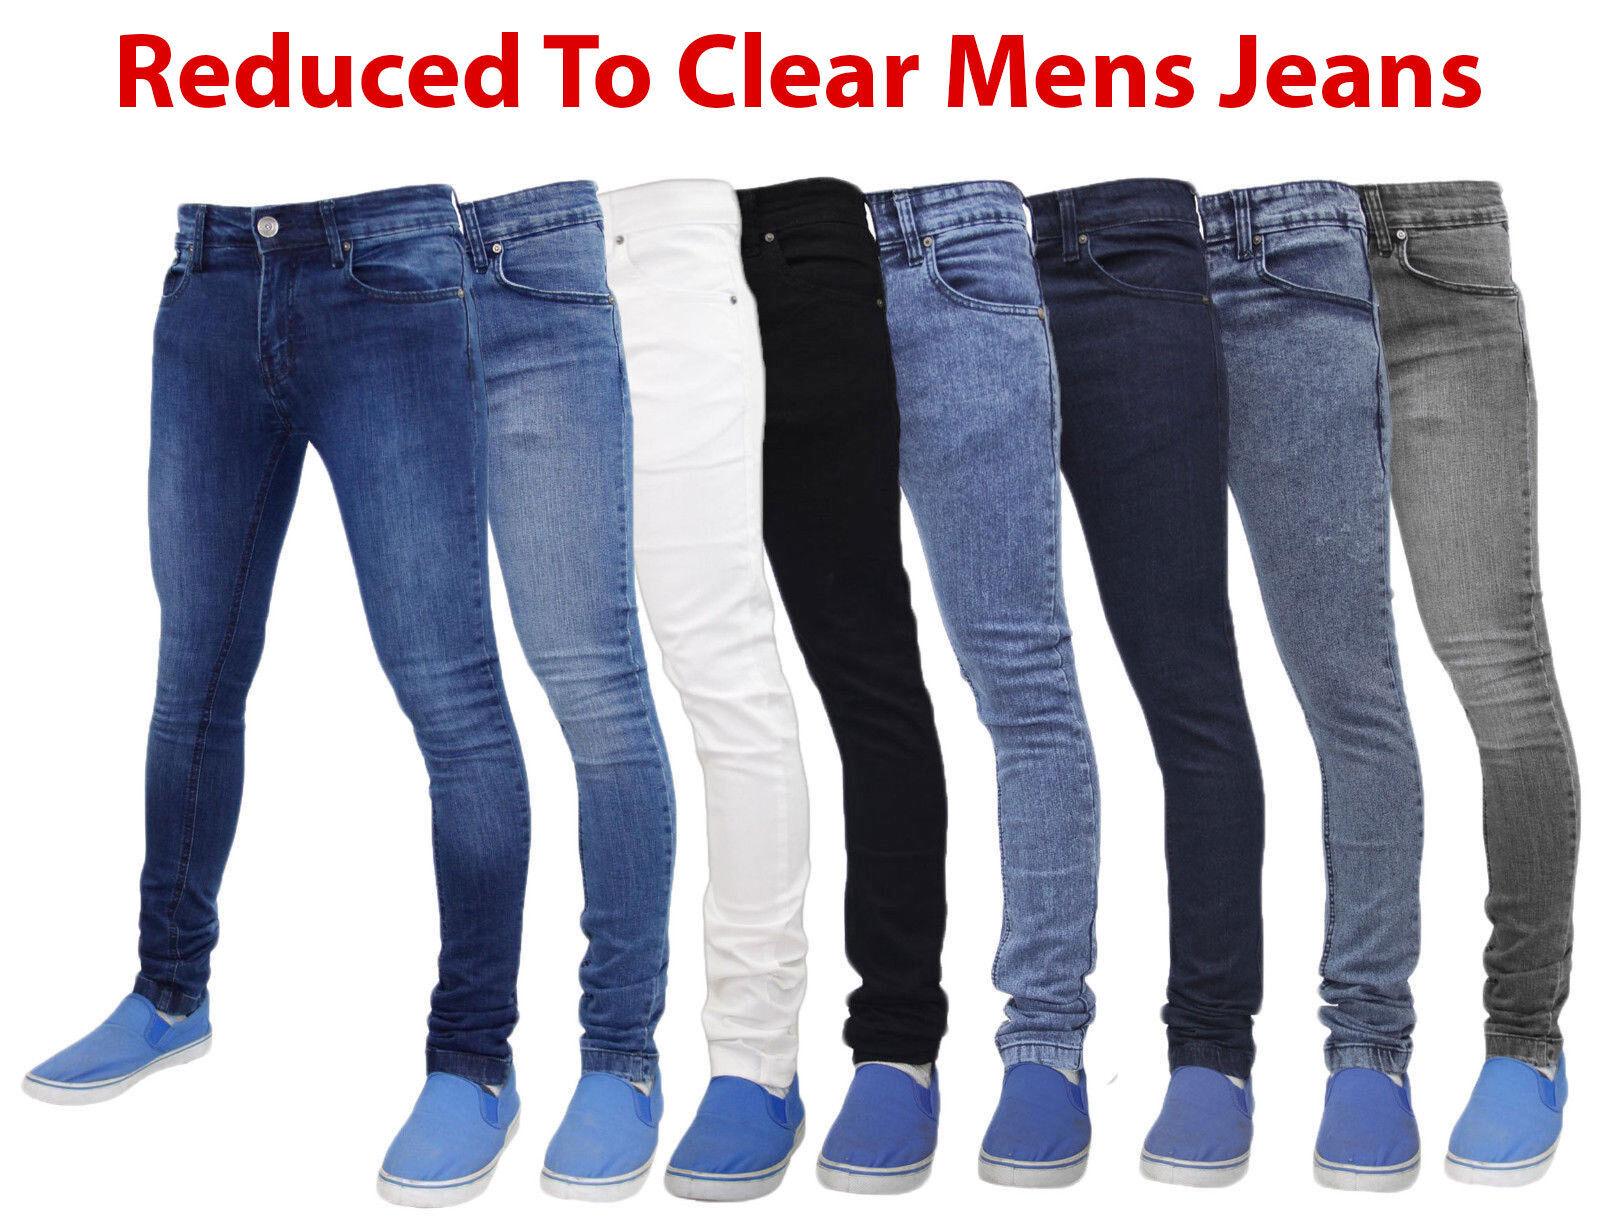 Pantaloni da Uomo di Jeans Skinny Stretch Slim Fit Denim Pantaloni Cotone ORIGINALE FLEX